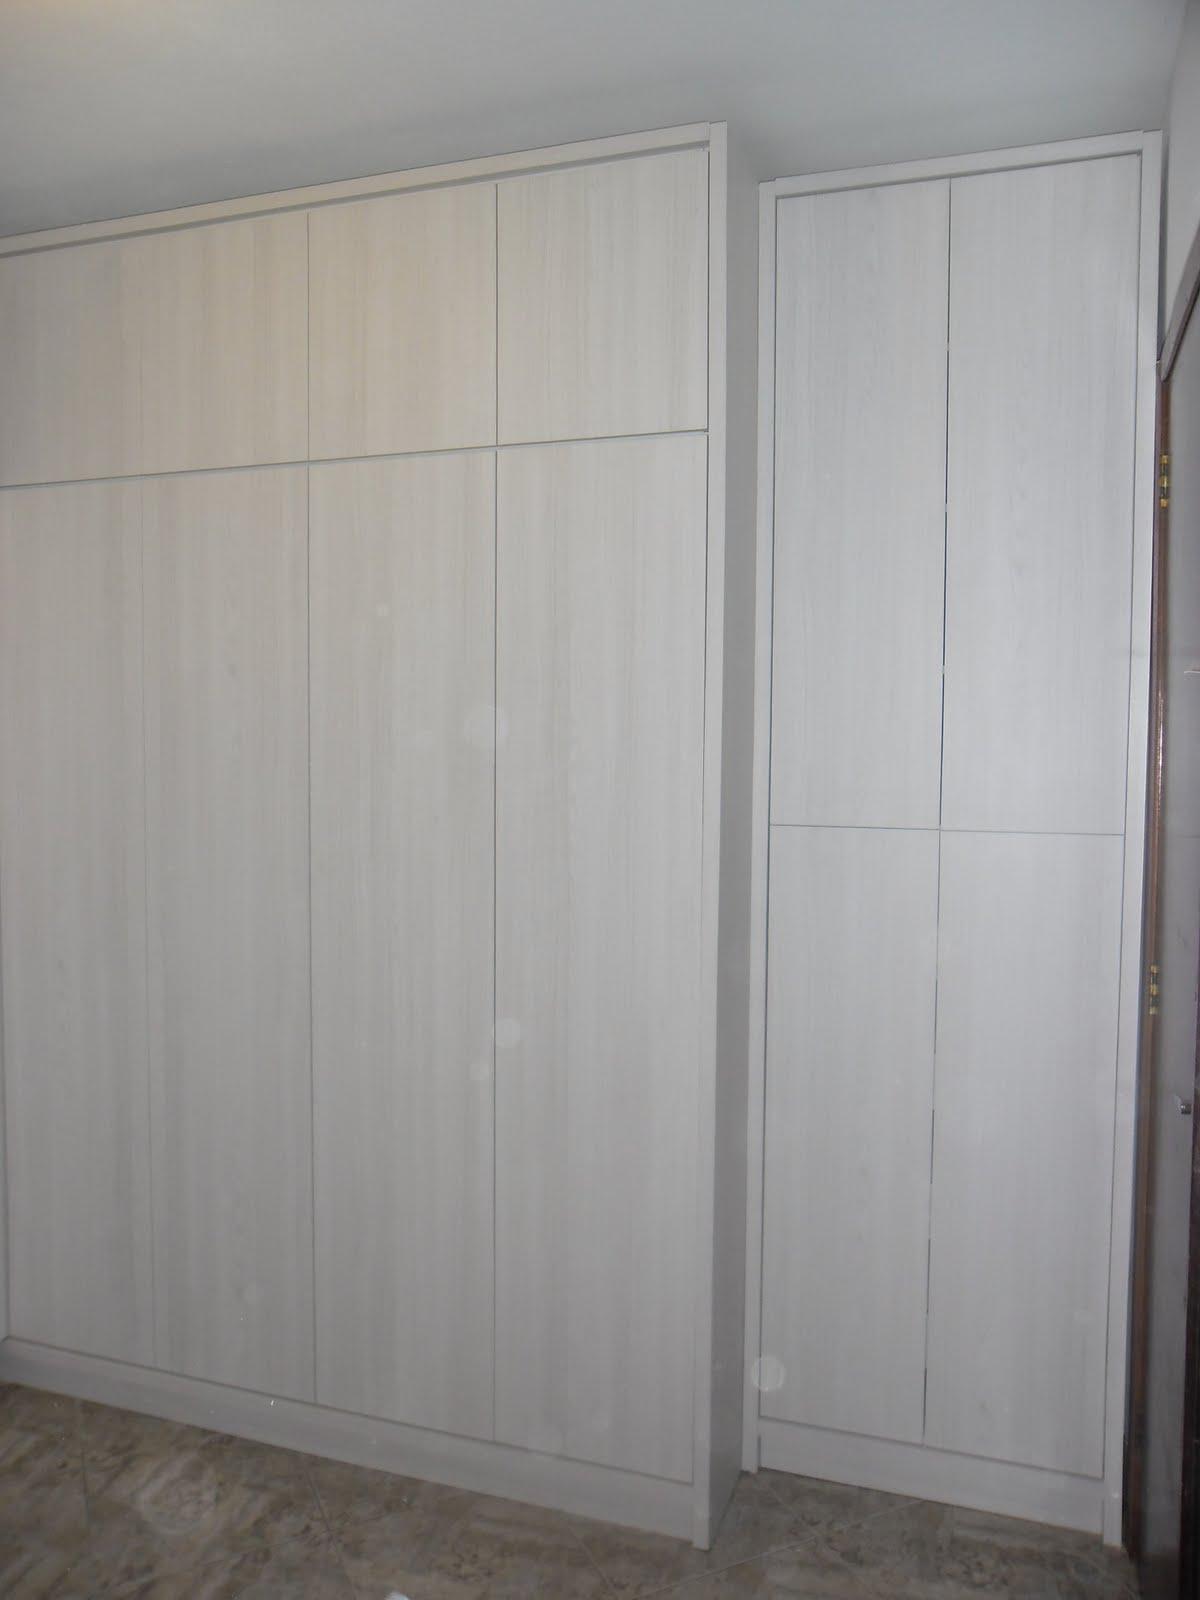 Silvano Moveis: Guarda roupas  sapateira .cor teka artico. #6F685C 1200x1600 Balcao Banheiro Suite